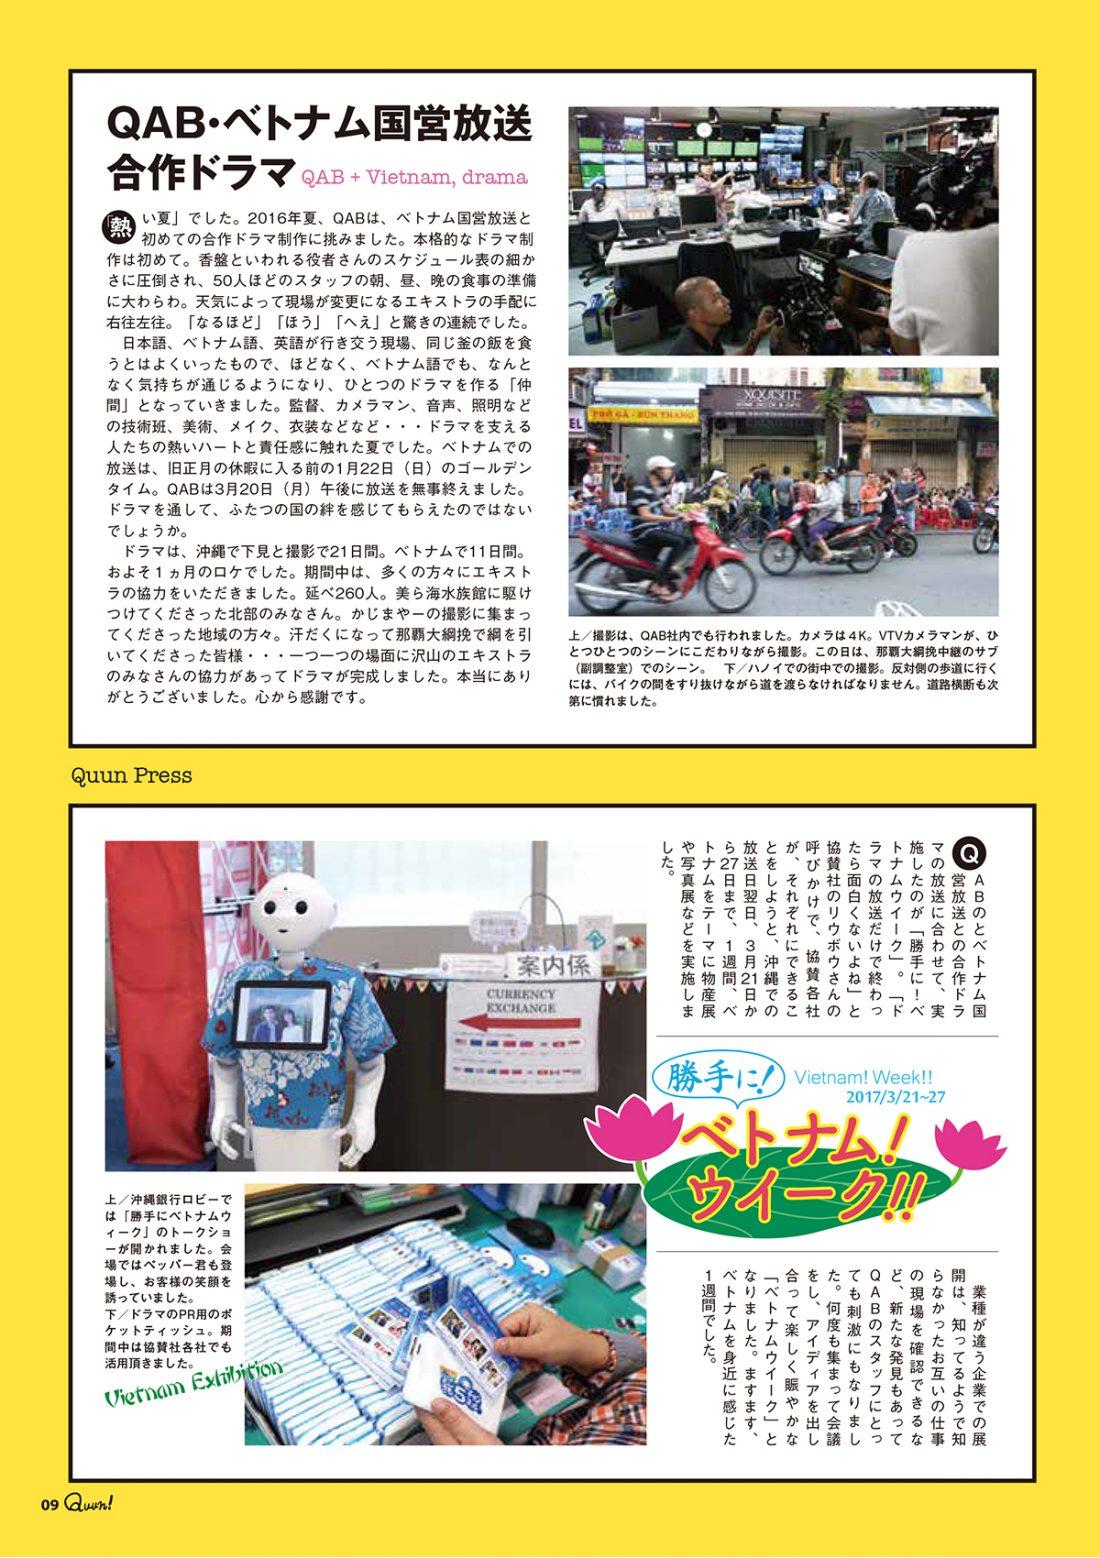 http://www.qab.co.jp/qgoro/wp-content/uploads/quun_0711-1100x1558.jpg